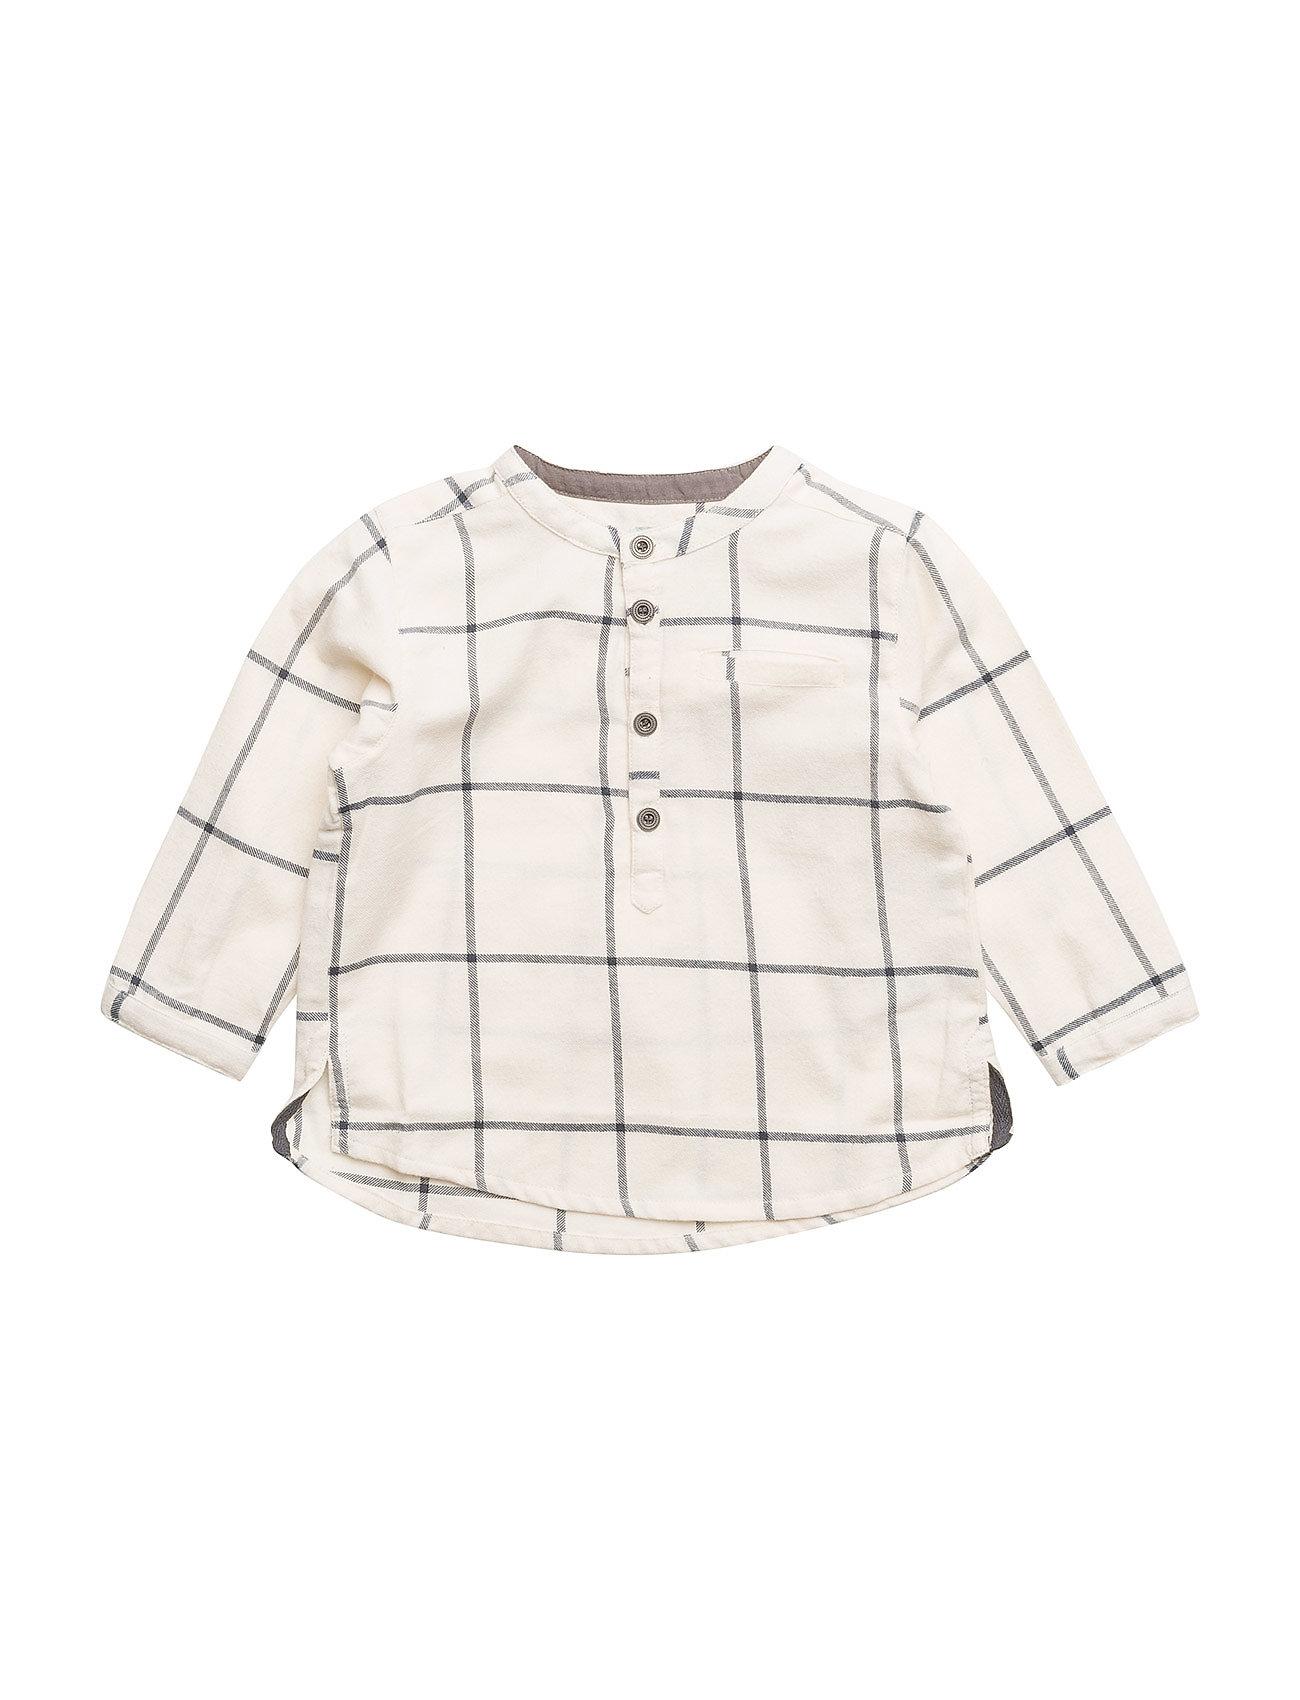 Mini A Ture Lai, M Shirt LS